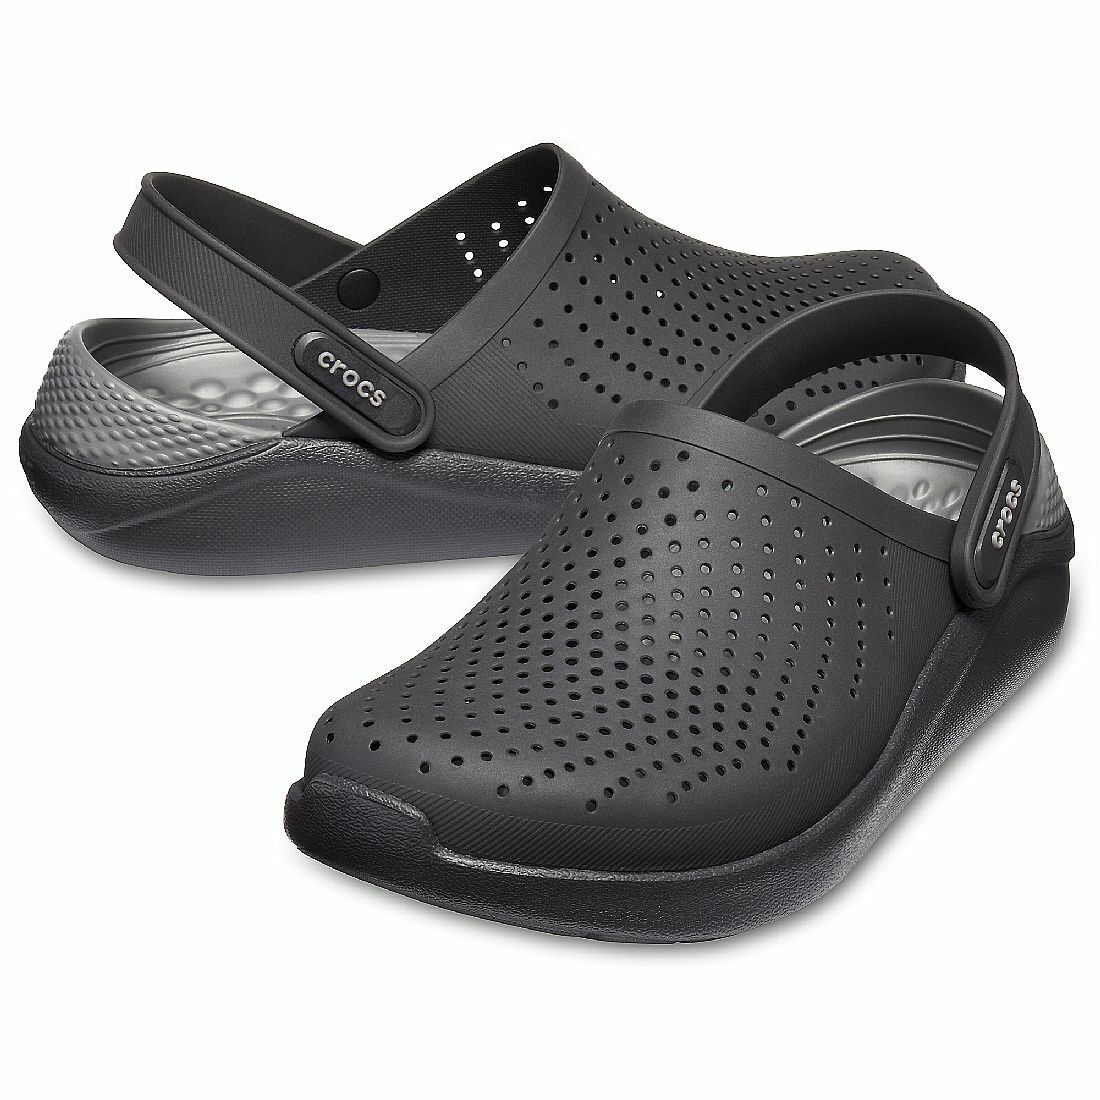 Crocs LiteRide Clog Unisex Erwachsene 204592 schwarz slate grau